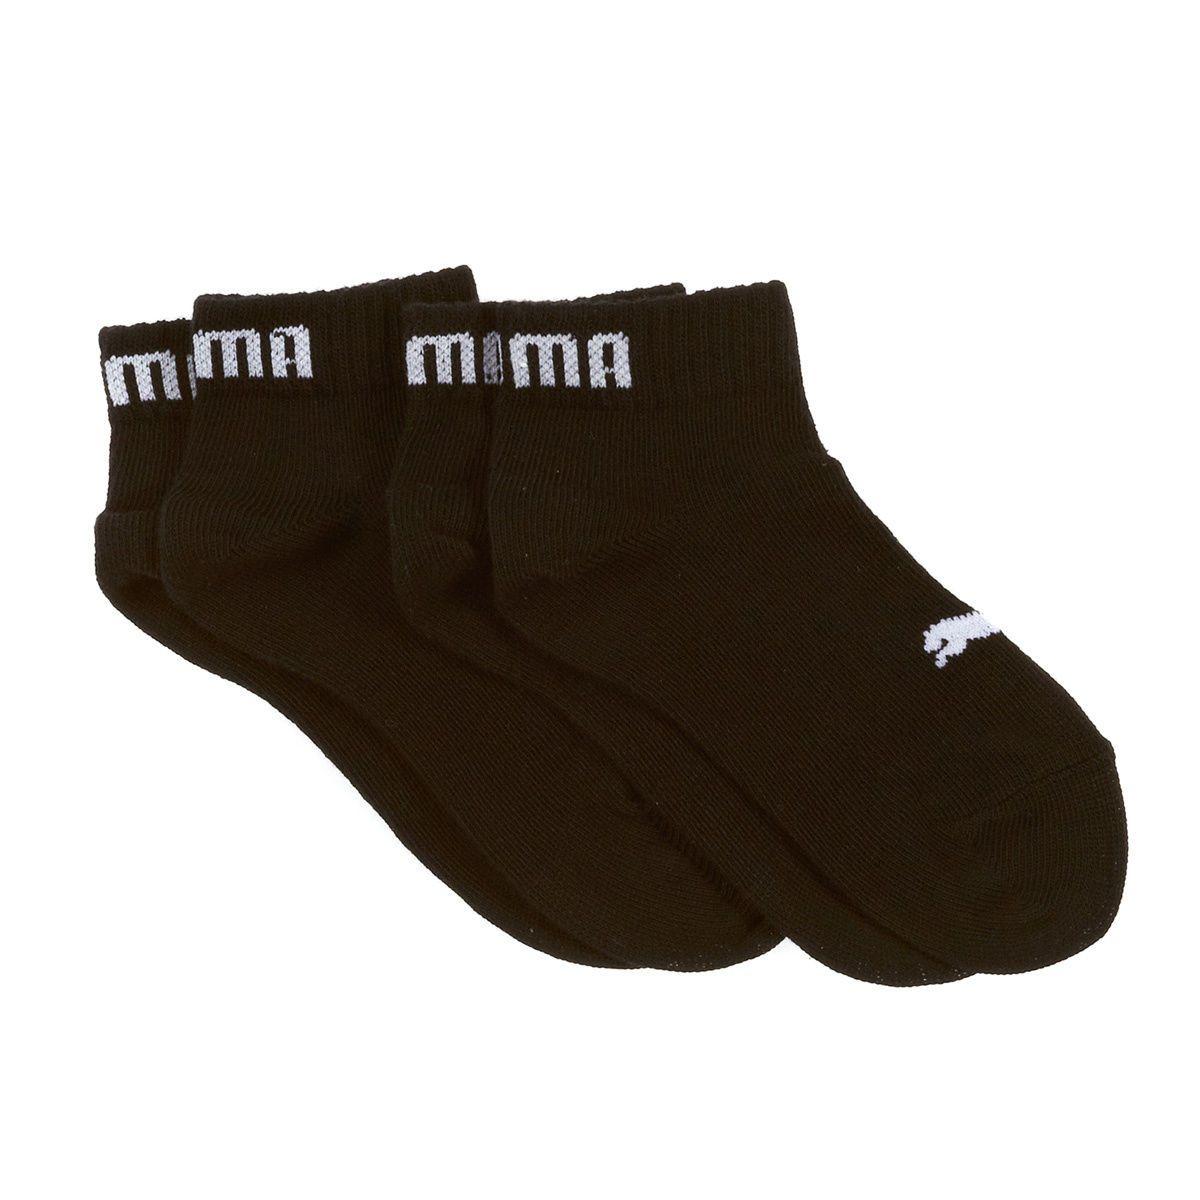 770acfe80 Buy puma socks boys > OFF63% Discounts